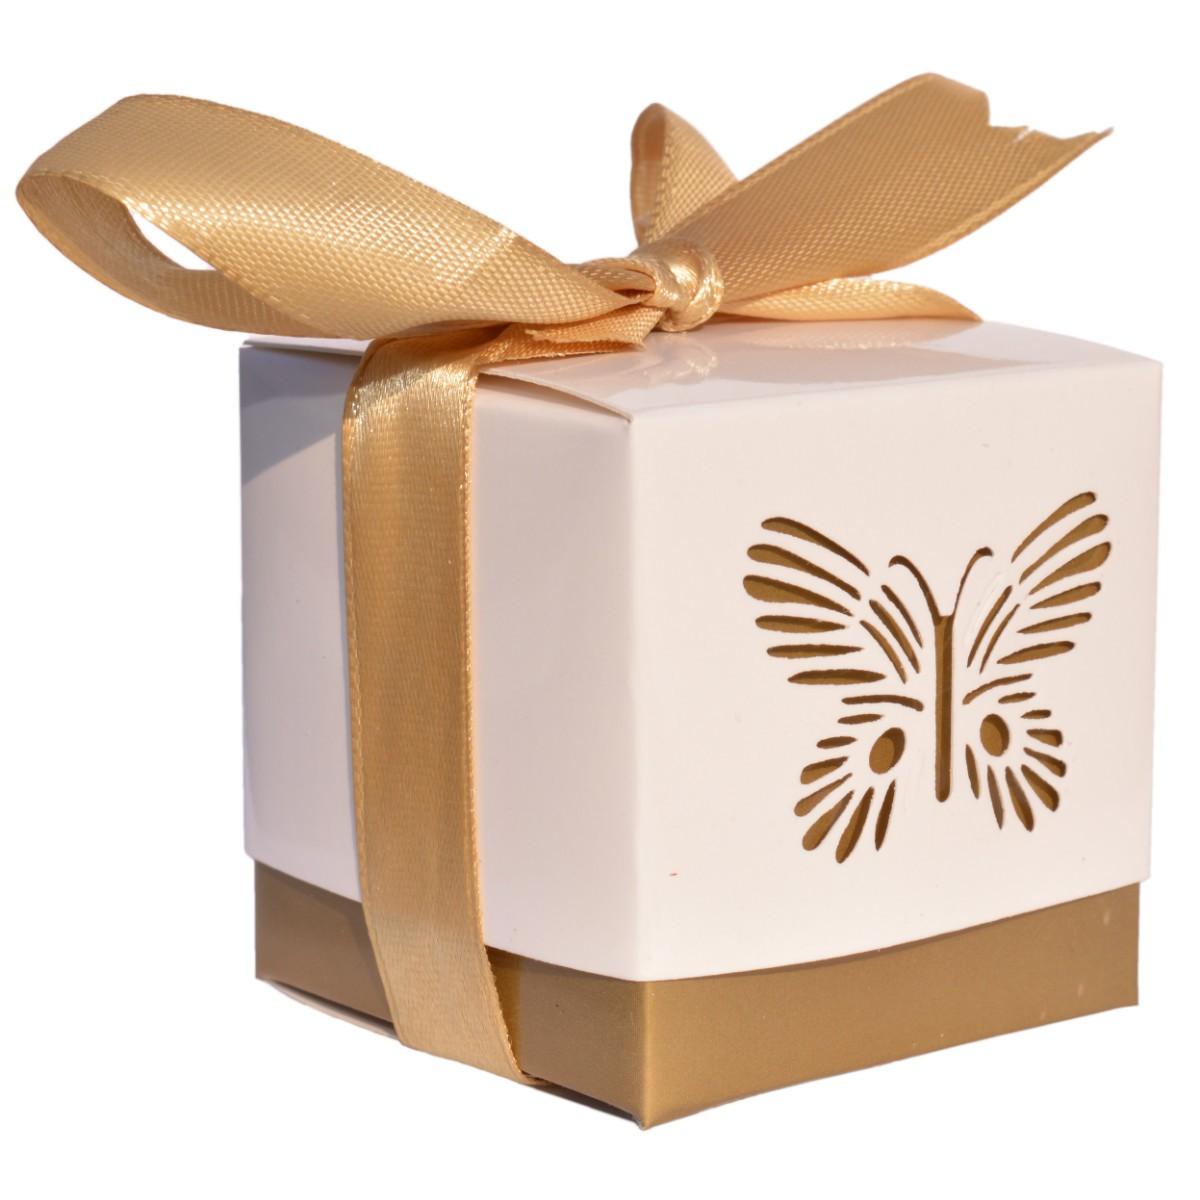 10er pack geschenkschachtel schmetterling gold deckel wei 5x5x5cm. Black Bedroom Furniture Sets. Home Design Ideas